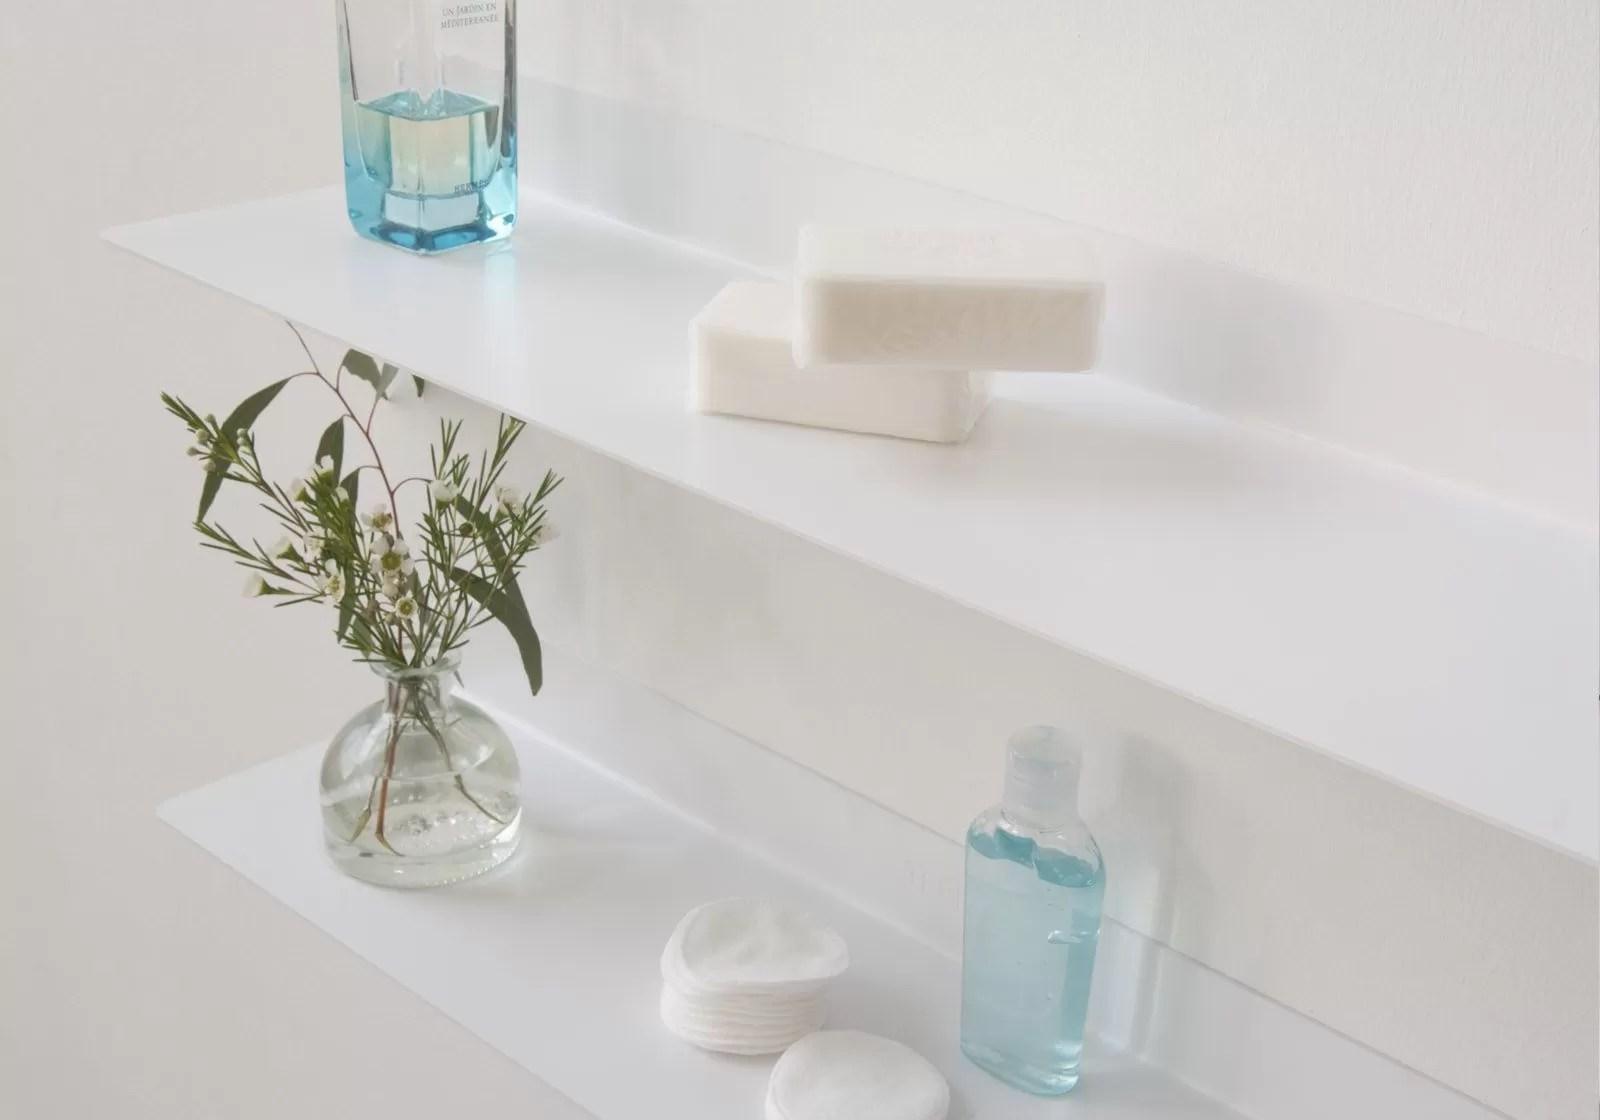 Fullsize Of Bathroom Wall Shelf